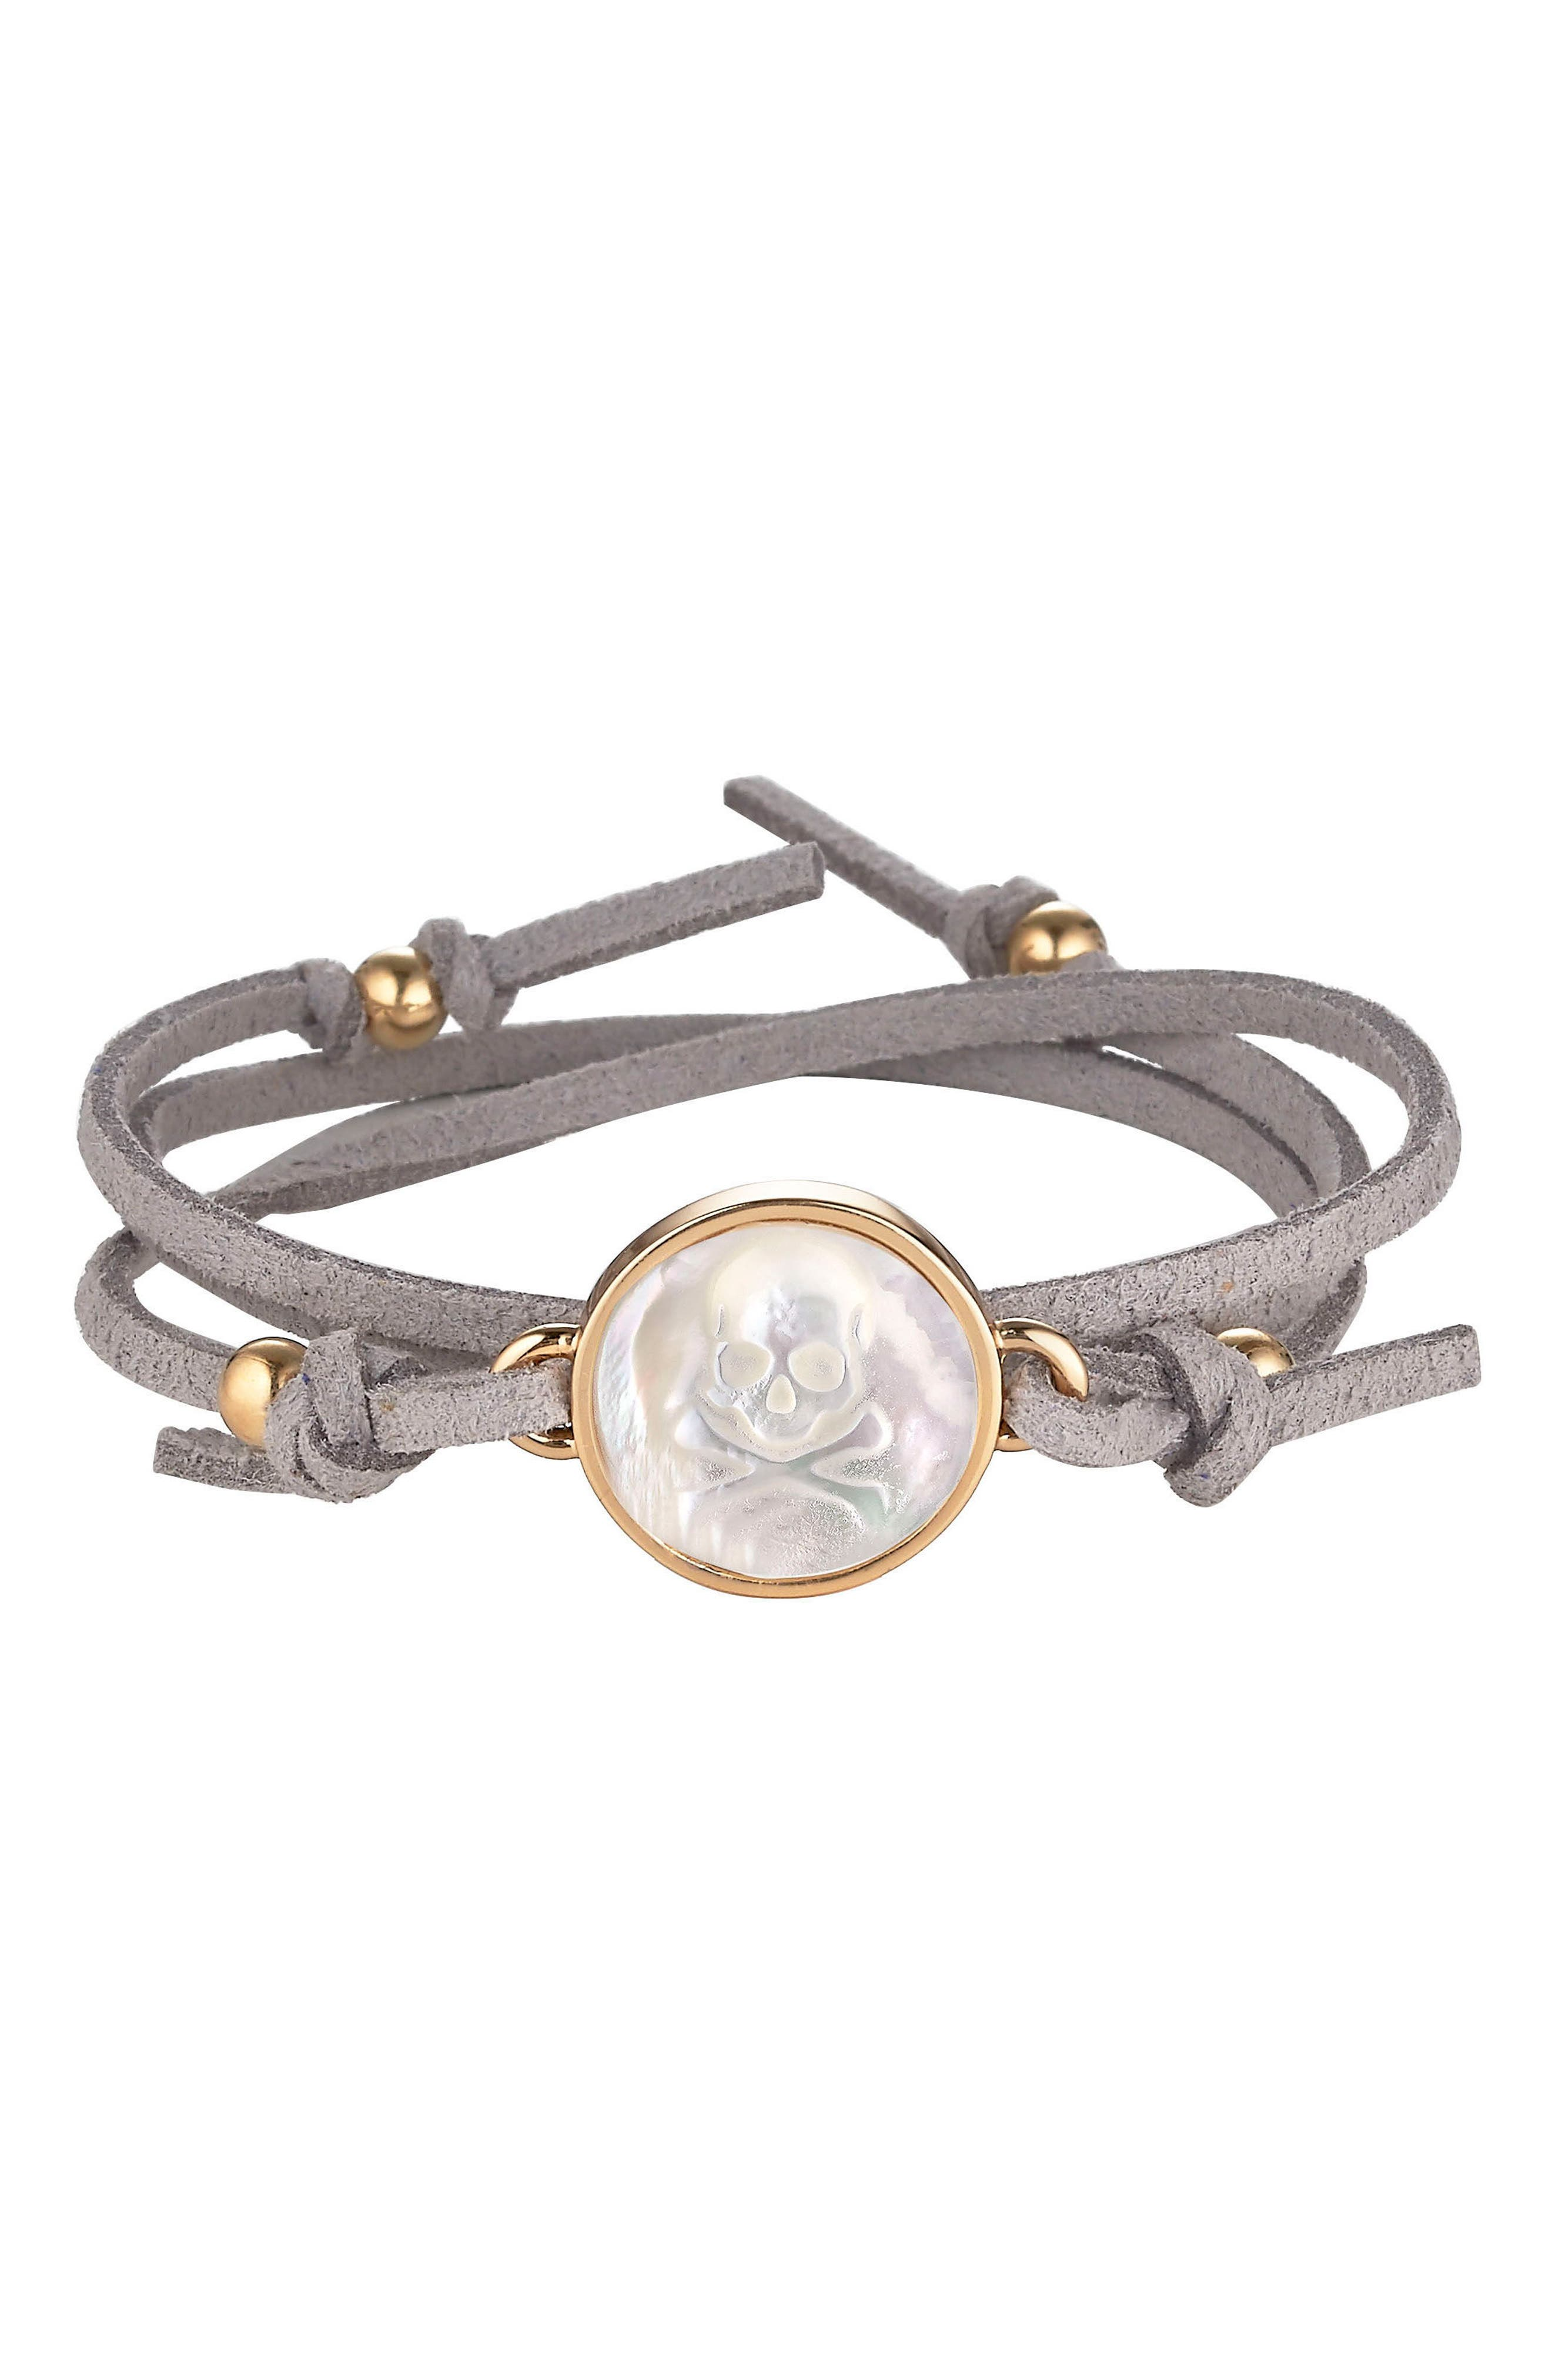 Skull & Bones Suede Wrap Bracelet,                         Main,                         color, GREY SKULL